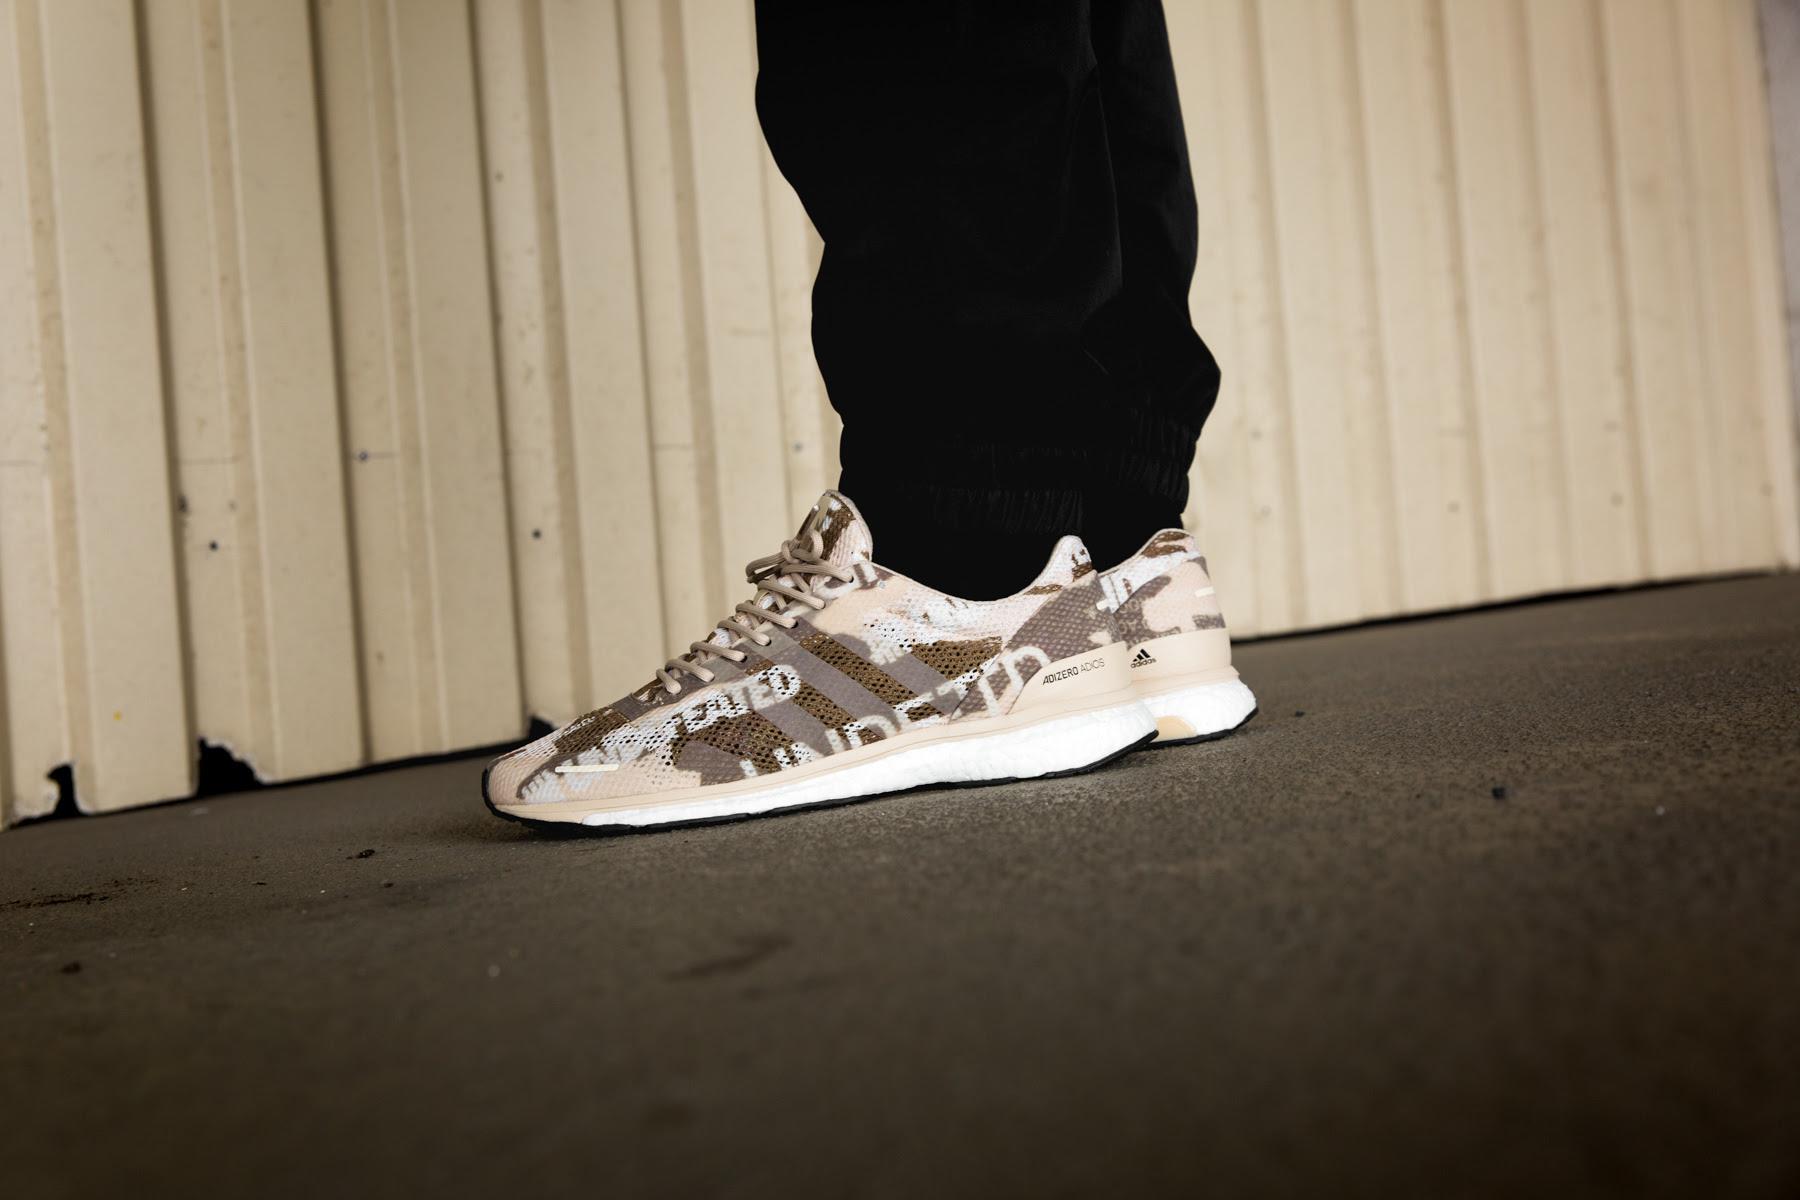 newest f37d4 1d7e7 adidas x Undefeated UltraBOOST  Adizero Adios - OG EUKicks Sneaker  Magazine